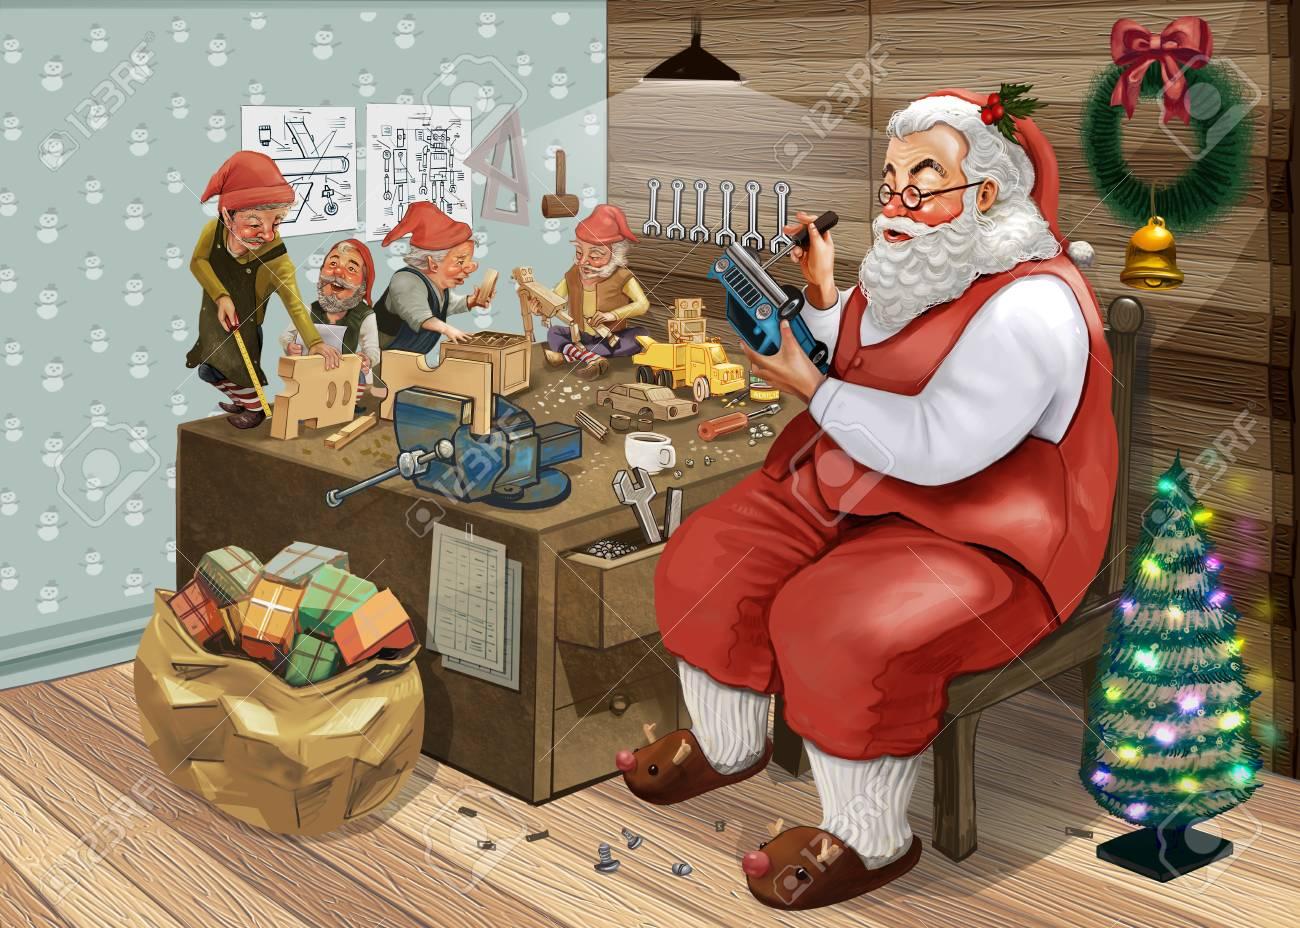 Making Christmas.Hand Drawn Santa Claus Making Christmas Presents With His Elves